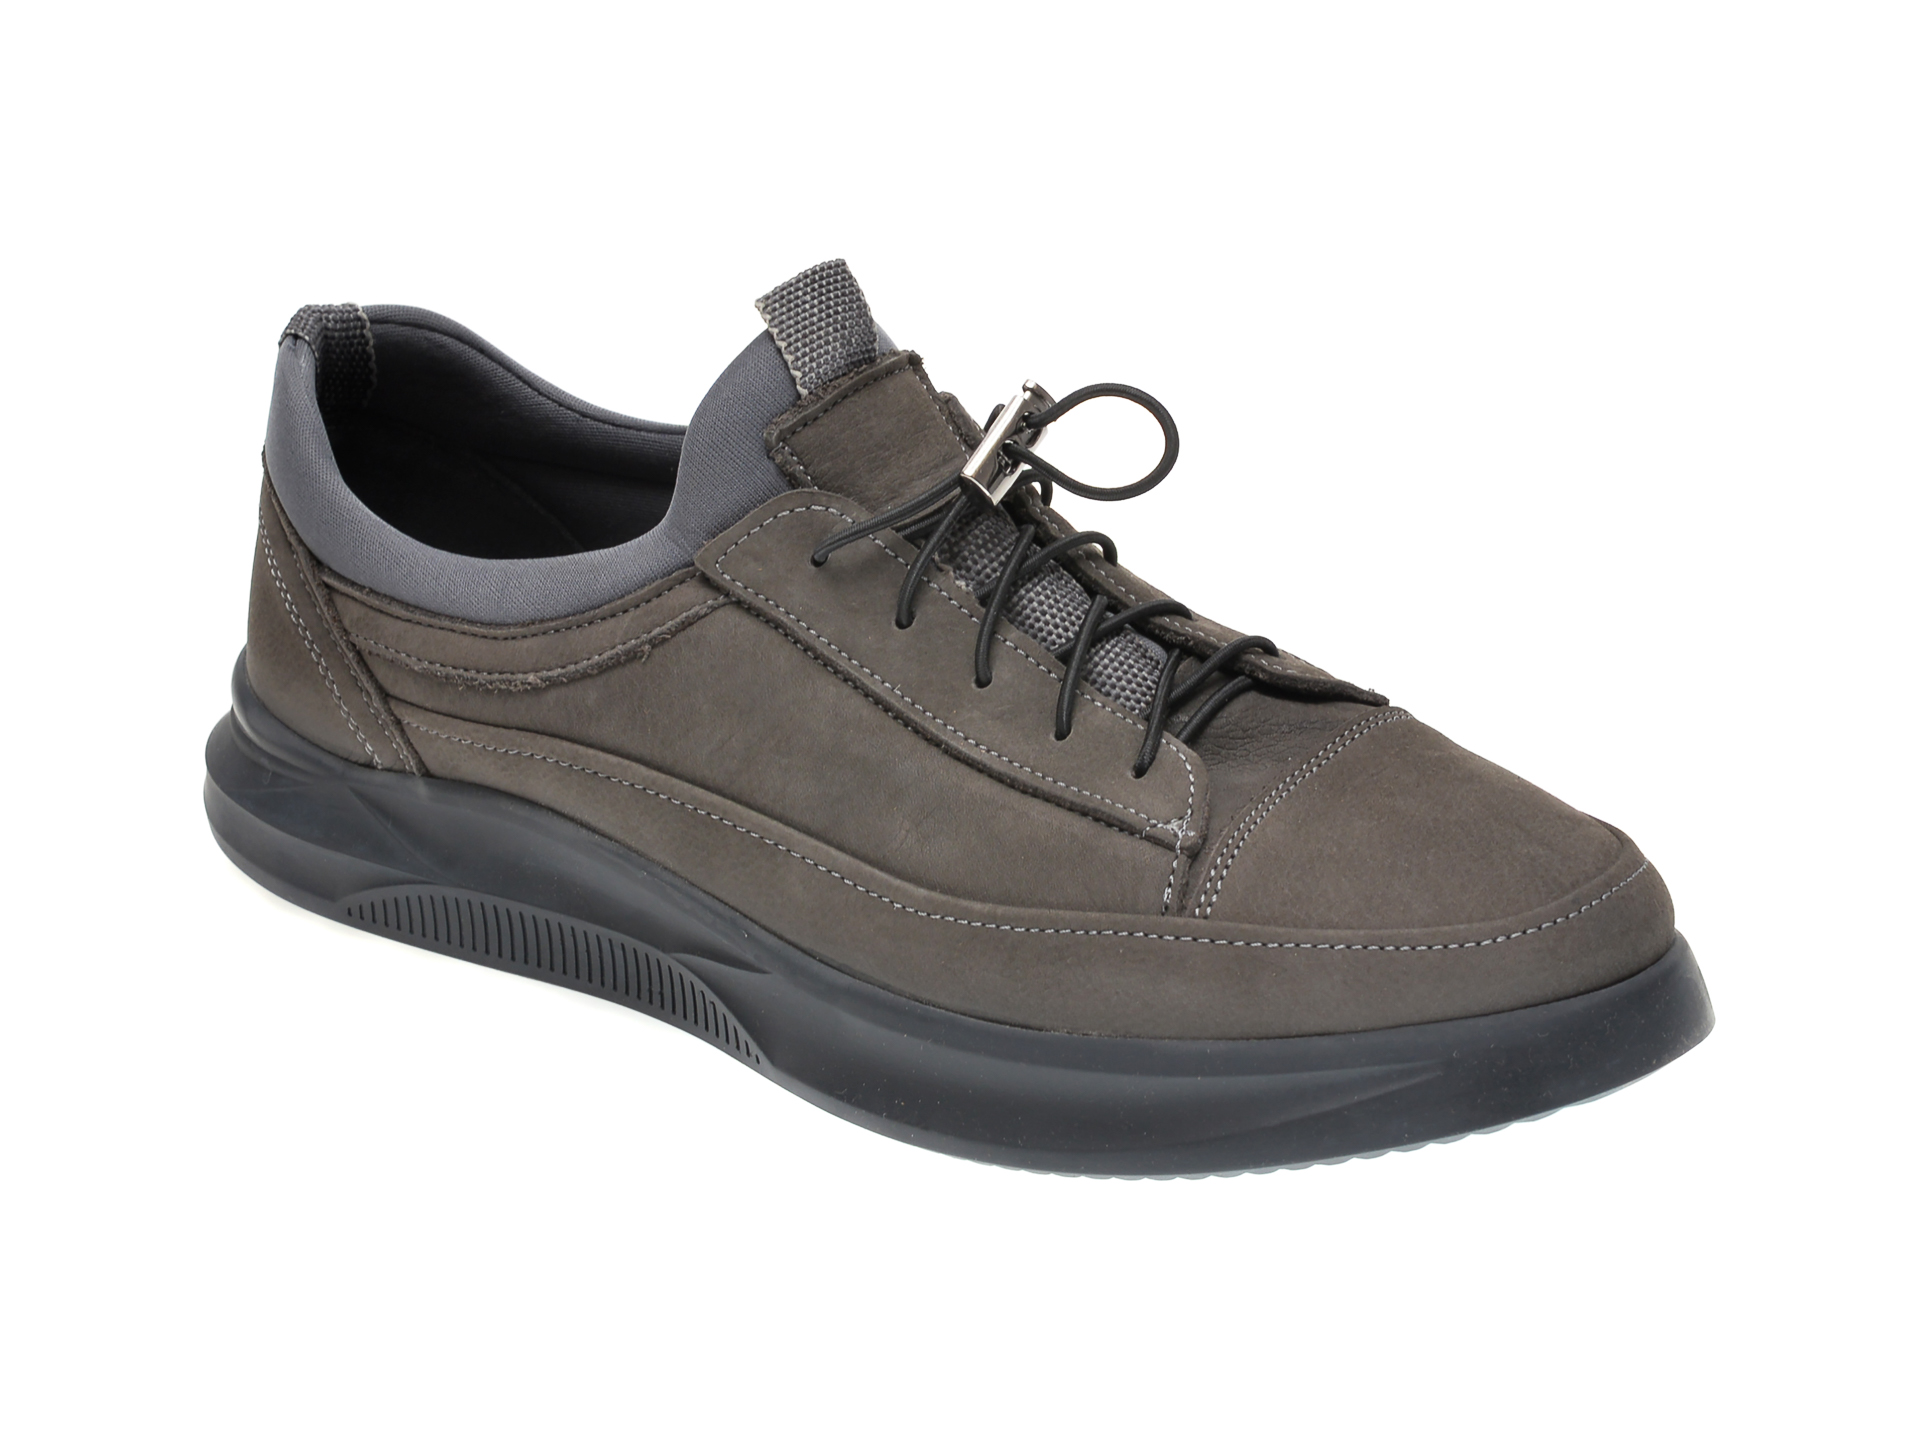 Pantofi OTTER gri, M5794, din nabuc